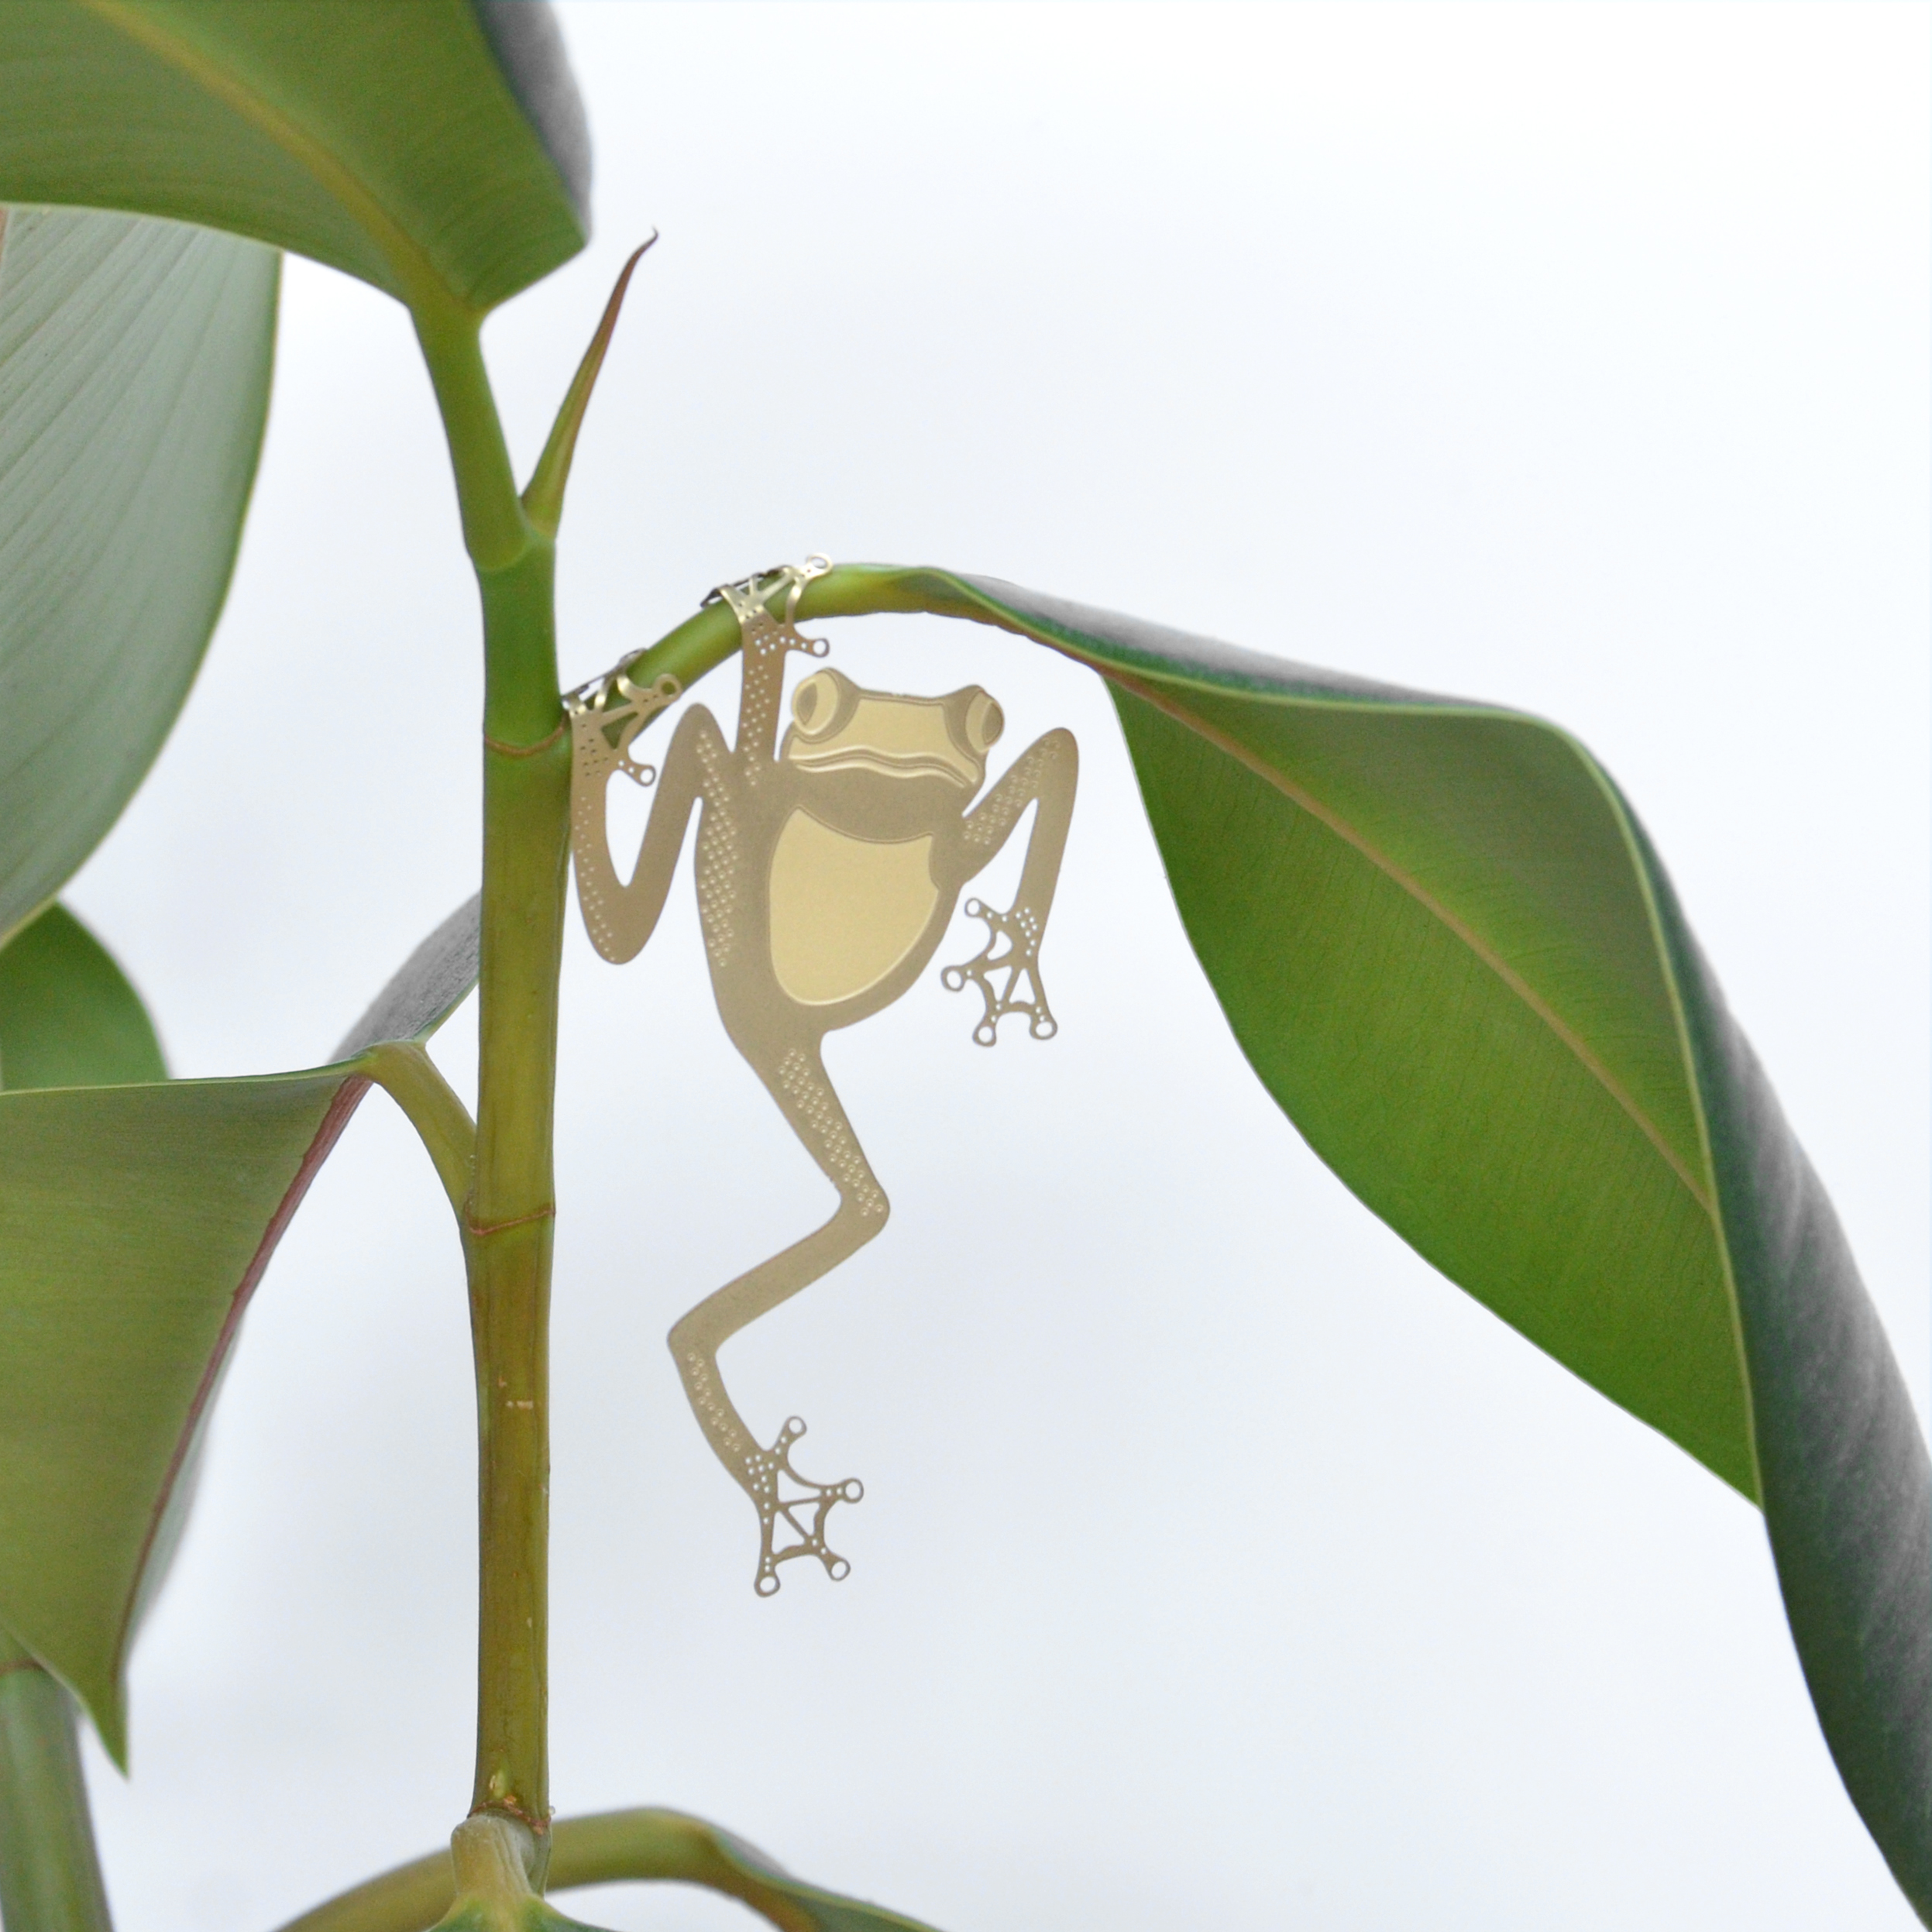 tree-frog-rubber.jpg